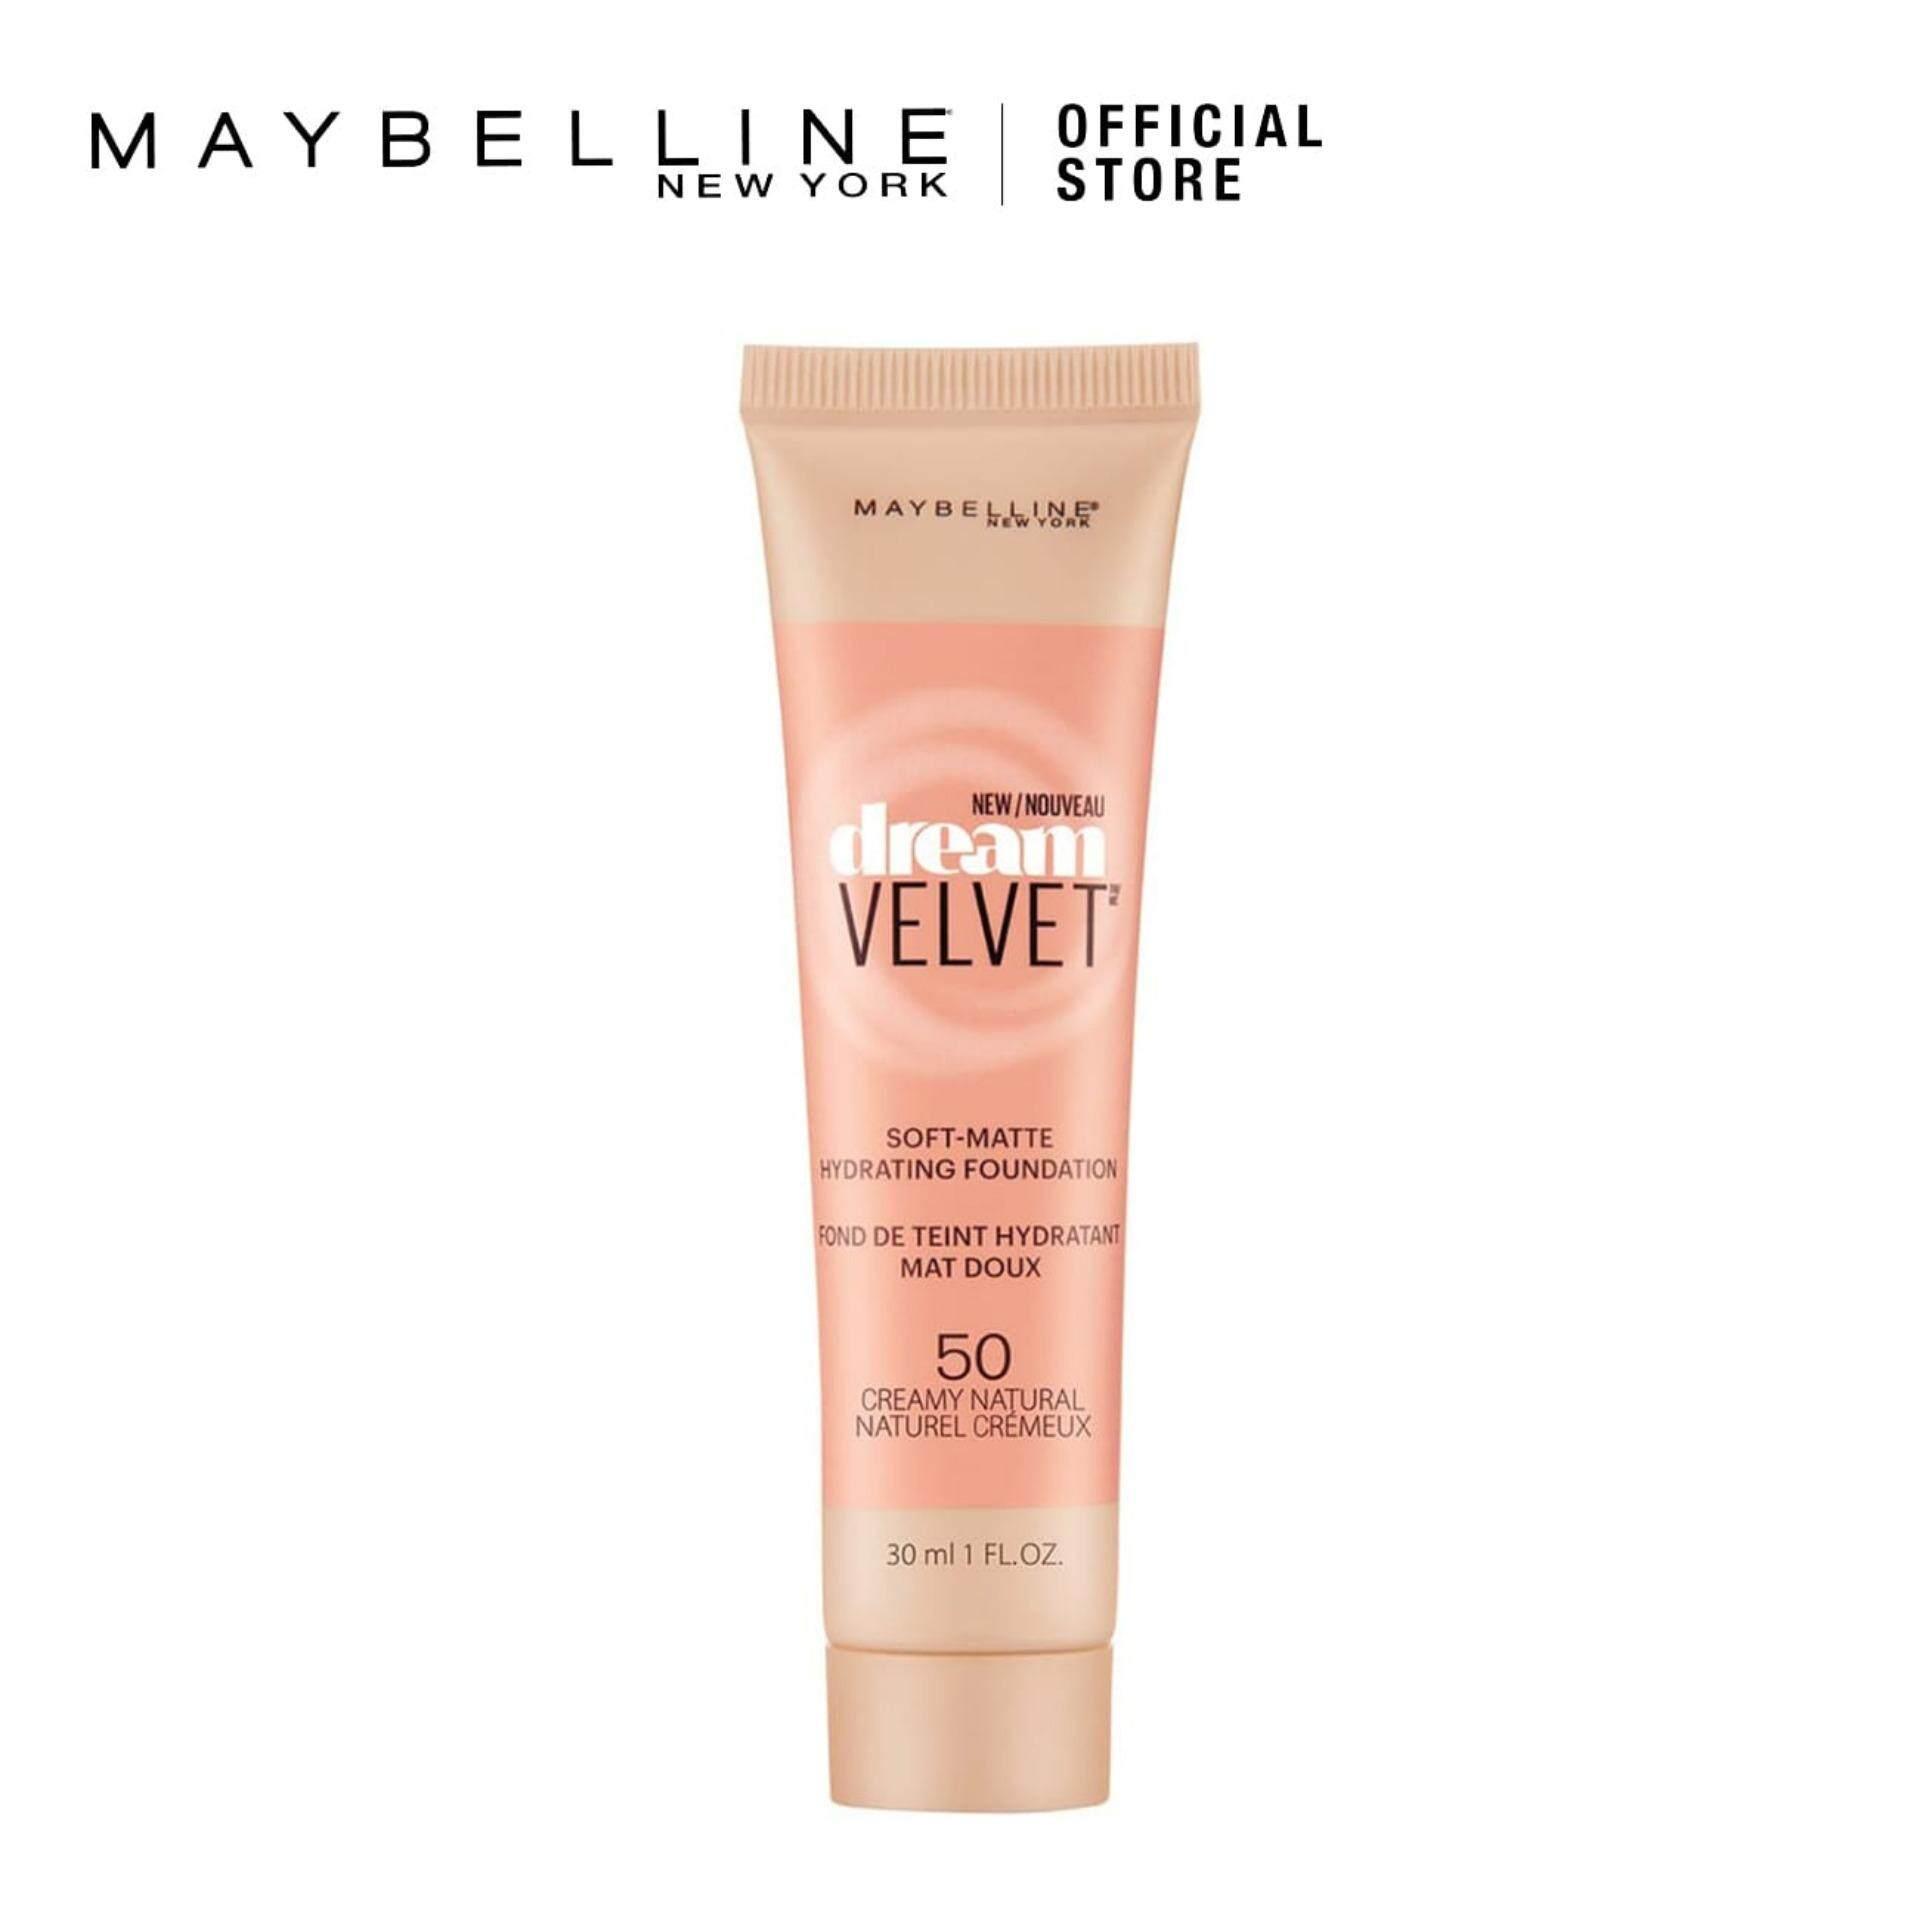 Sell Maybelline Dream Lumi Cheapest Best Quality My Store Satin Two Way Cake 01 Light Skin Foundation Po3 1smyr46 Myr 47